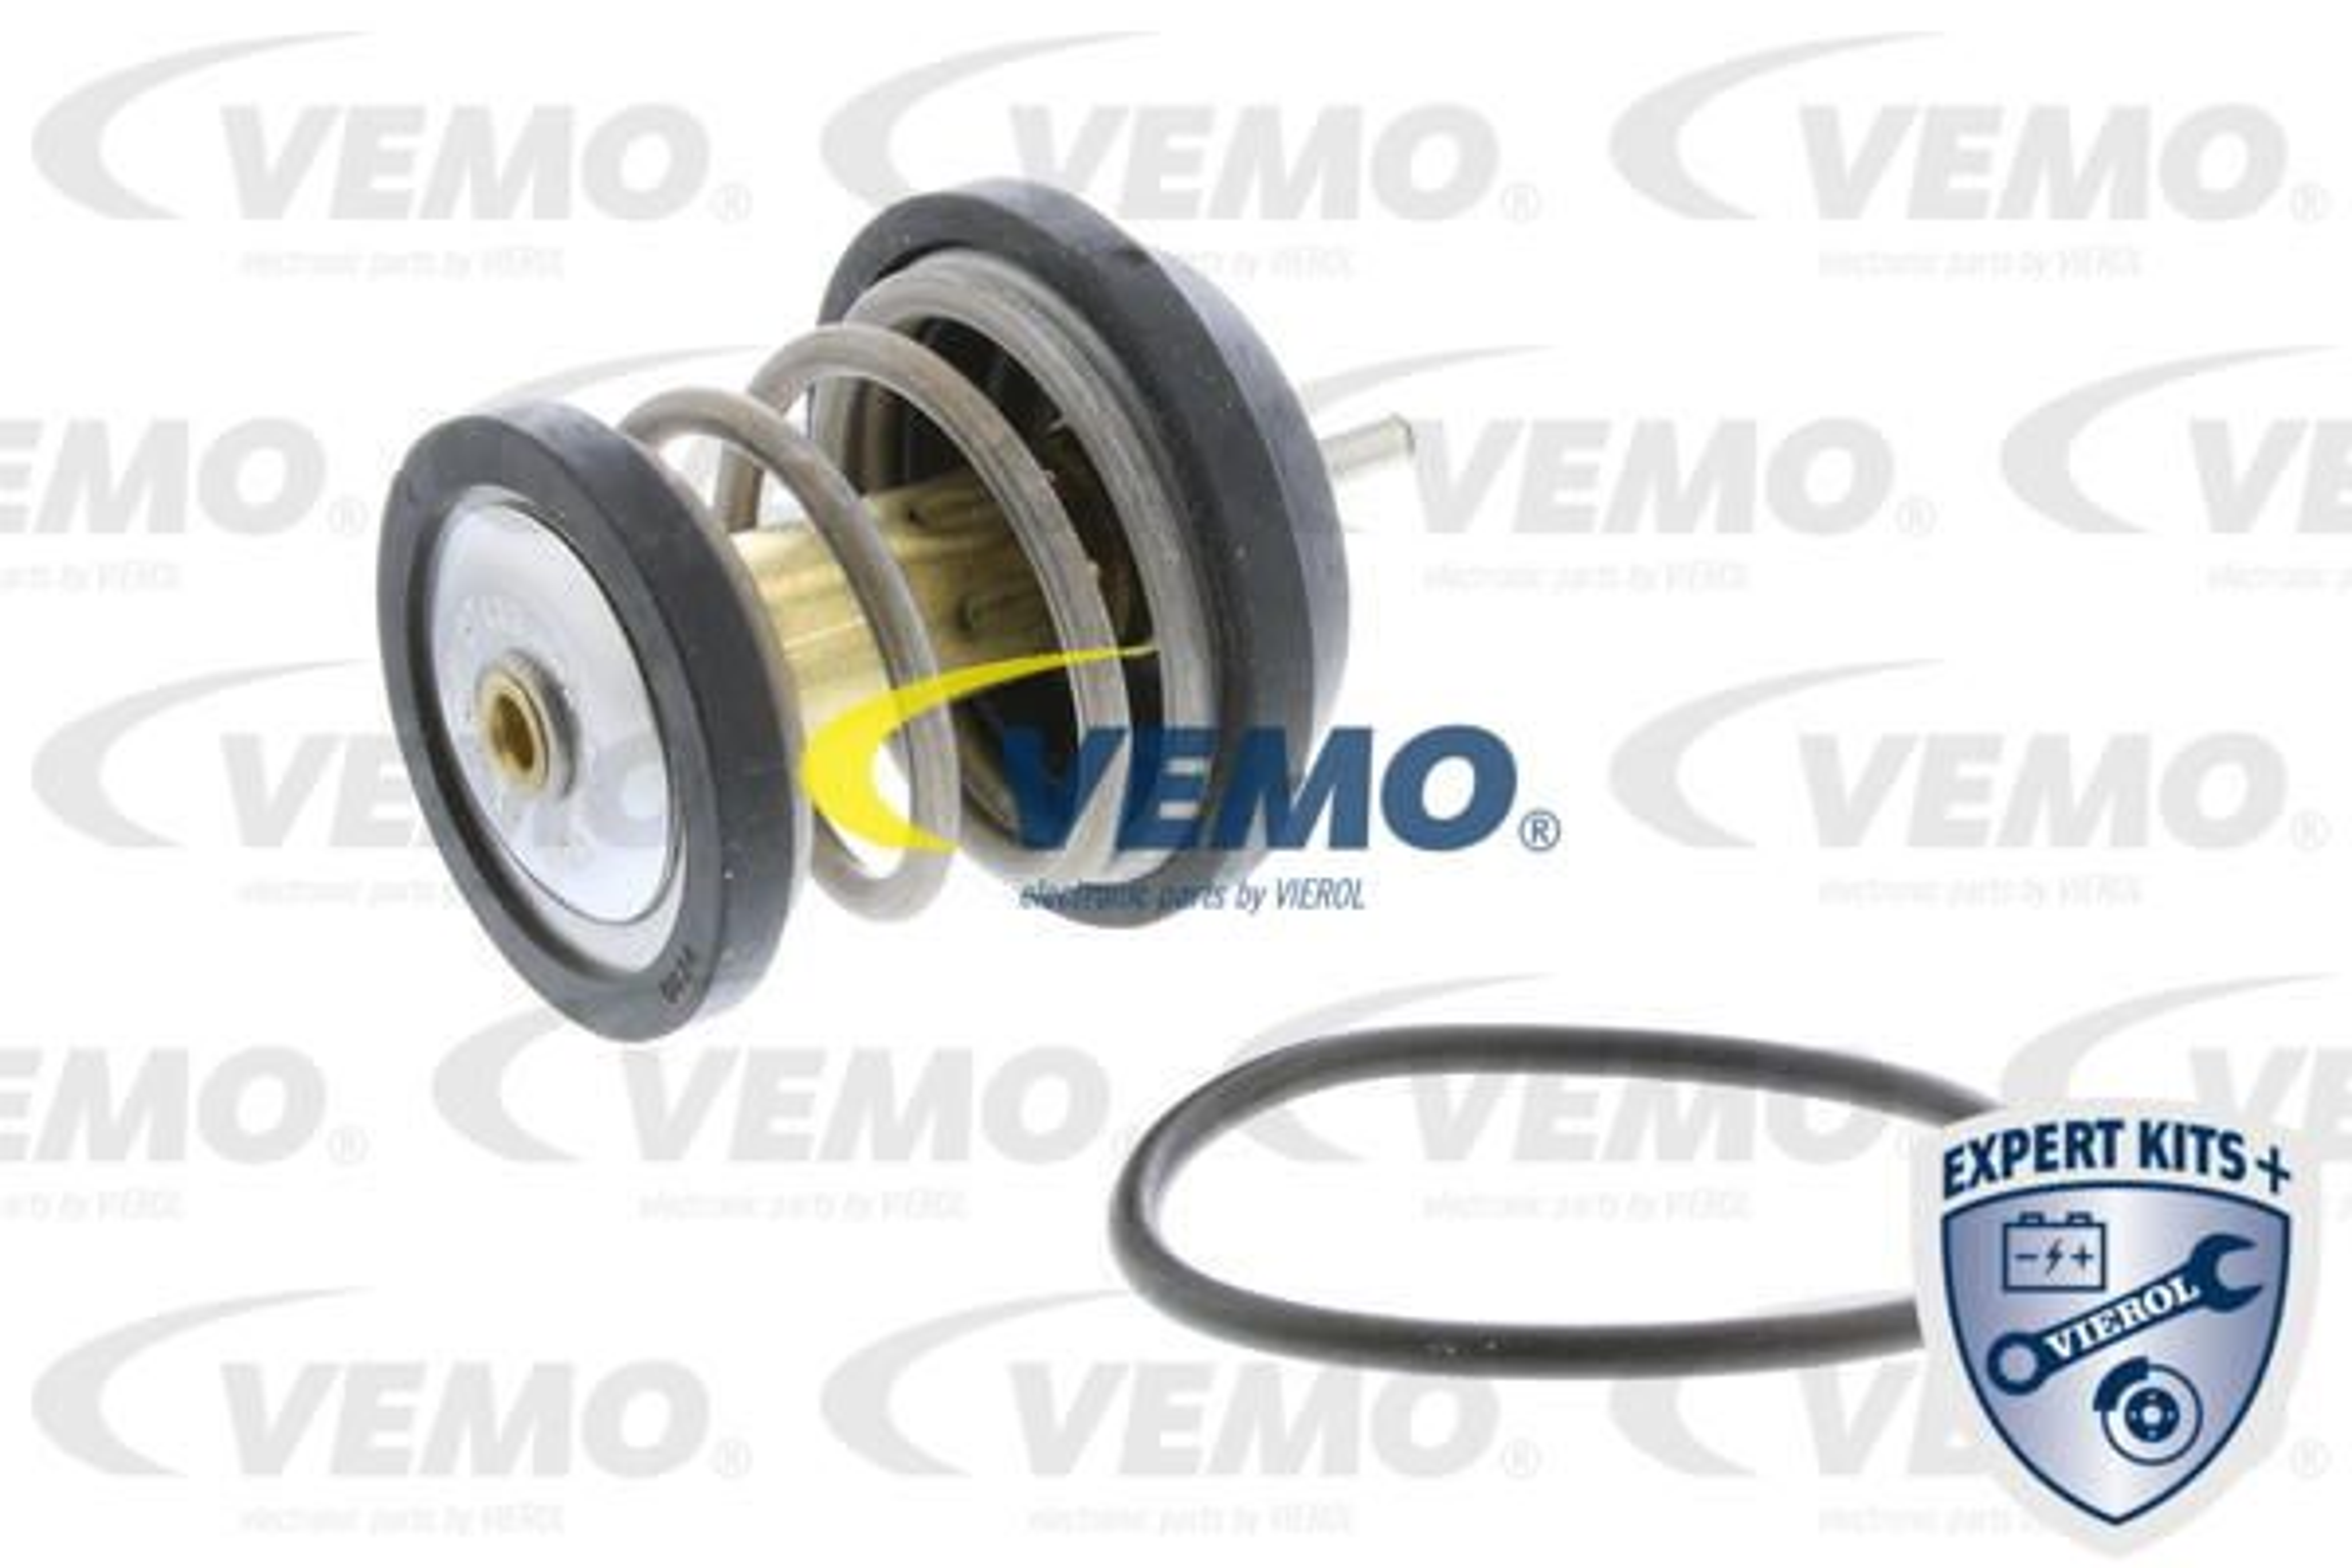 Kühlwasserthermostat V15-99-2068 VEMO V15-99-2068 in Original Qualität